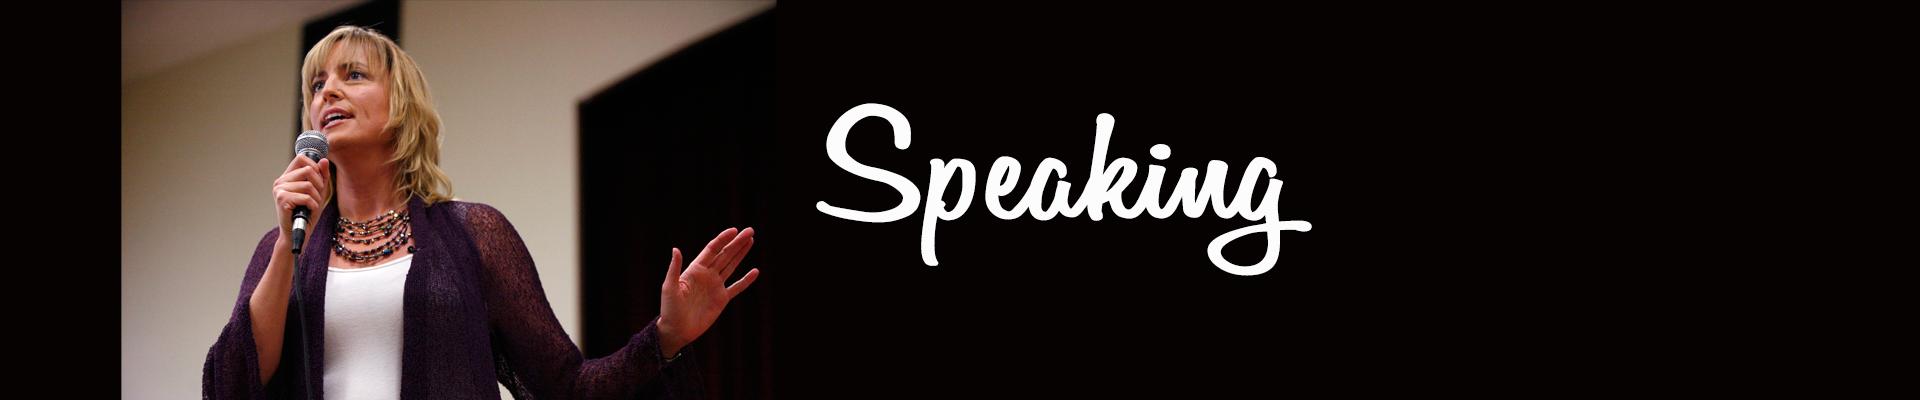 Speaker-page-banner.png